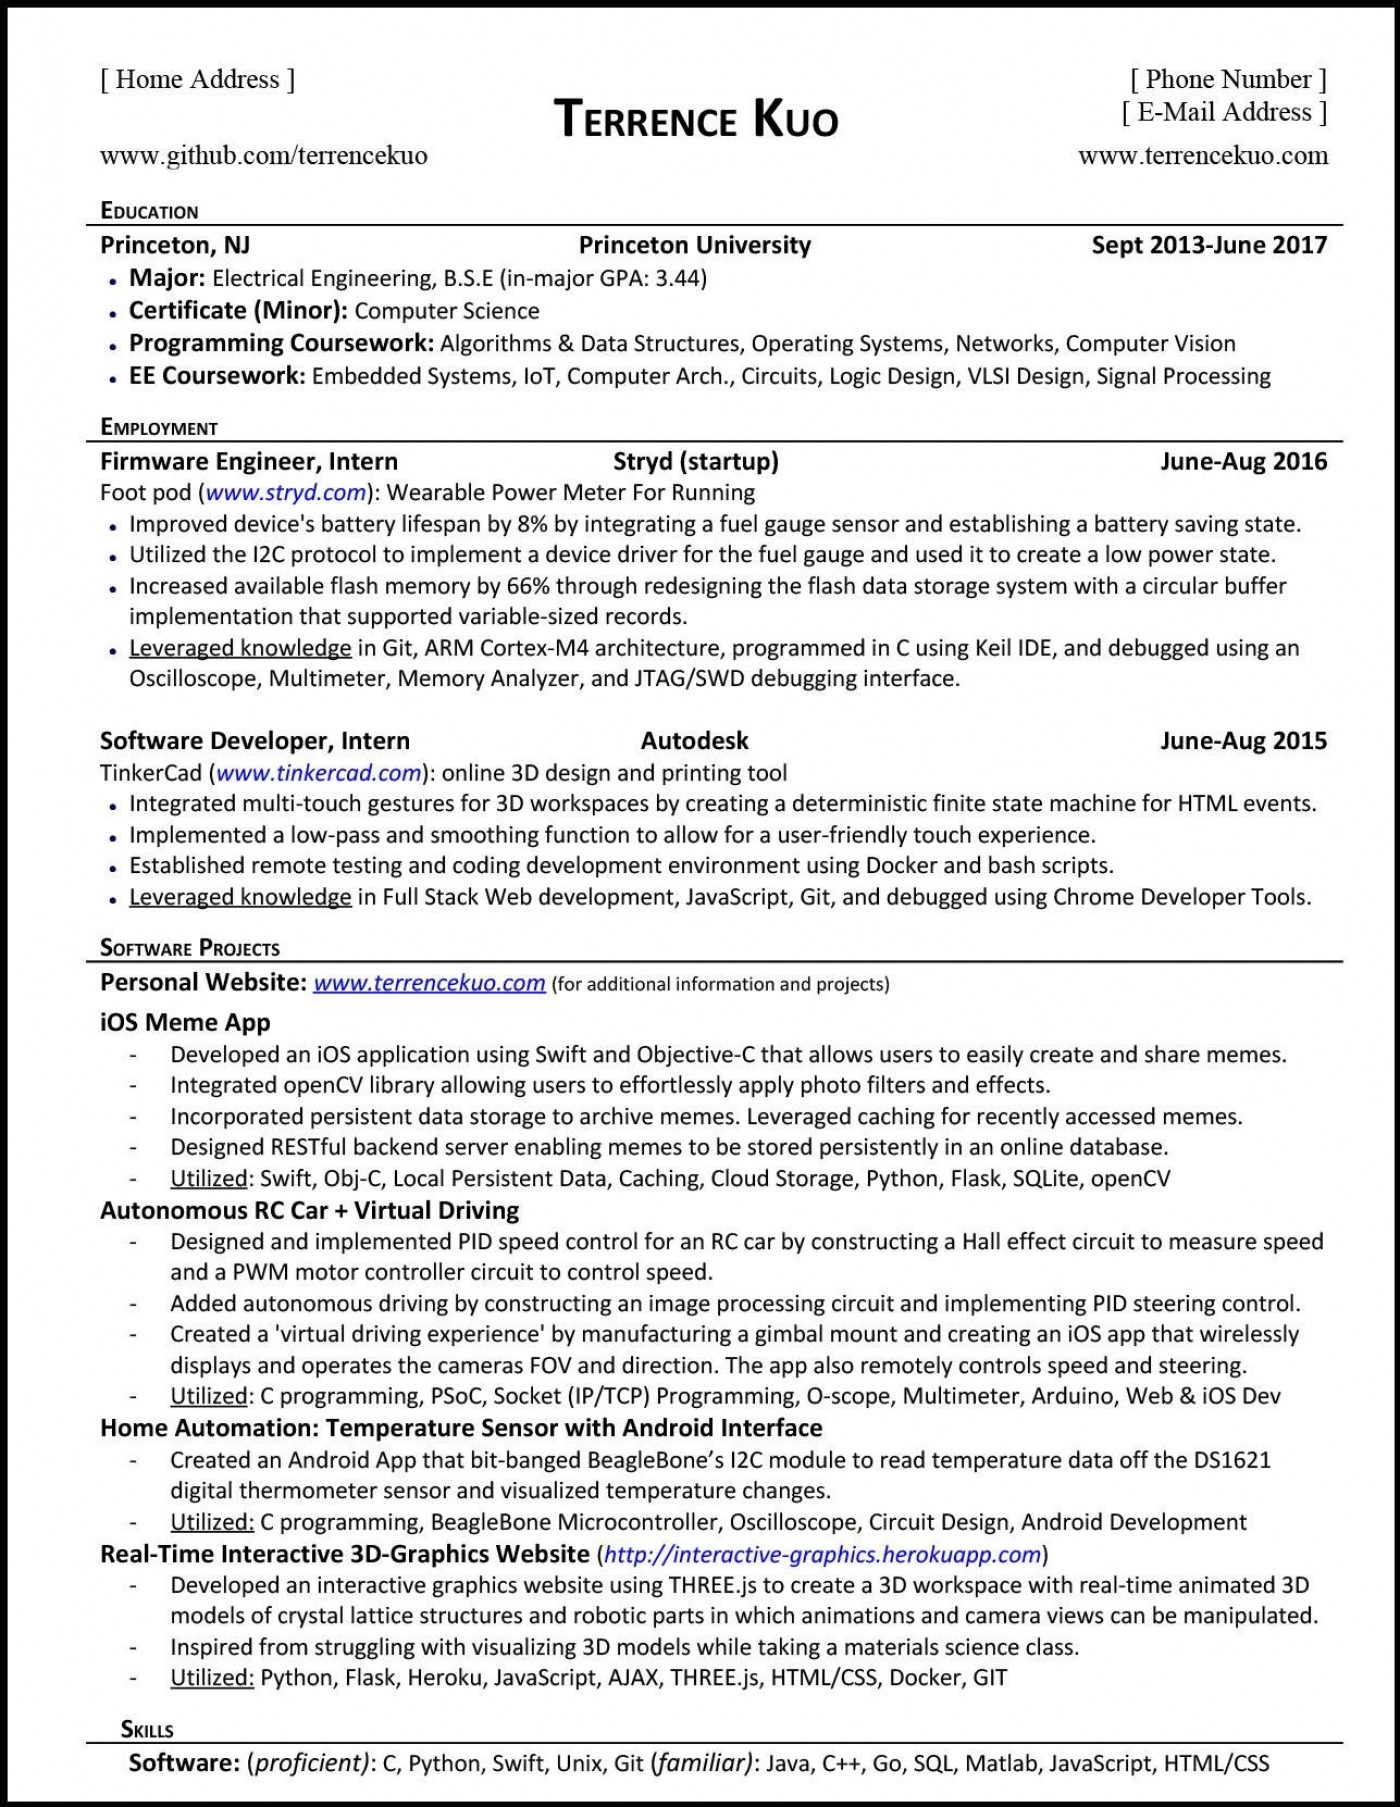 000 Top Software Engineering Resume Template High Resolution  Engineer Microsoft Word Cv Free Developer Download1400